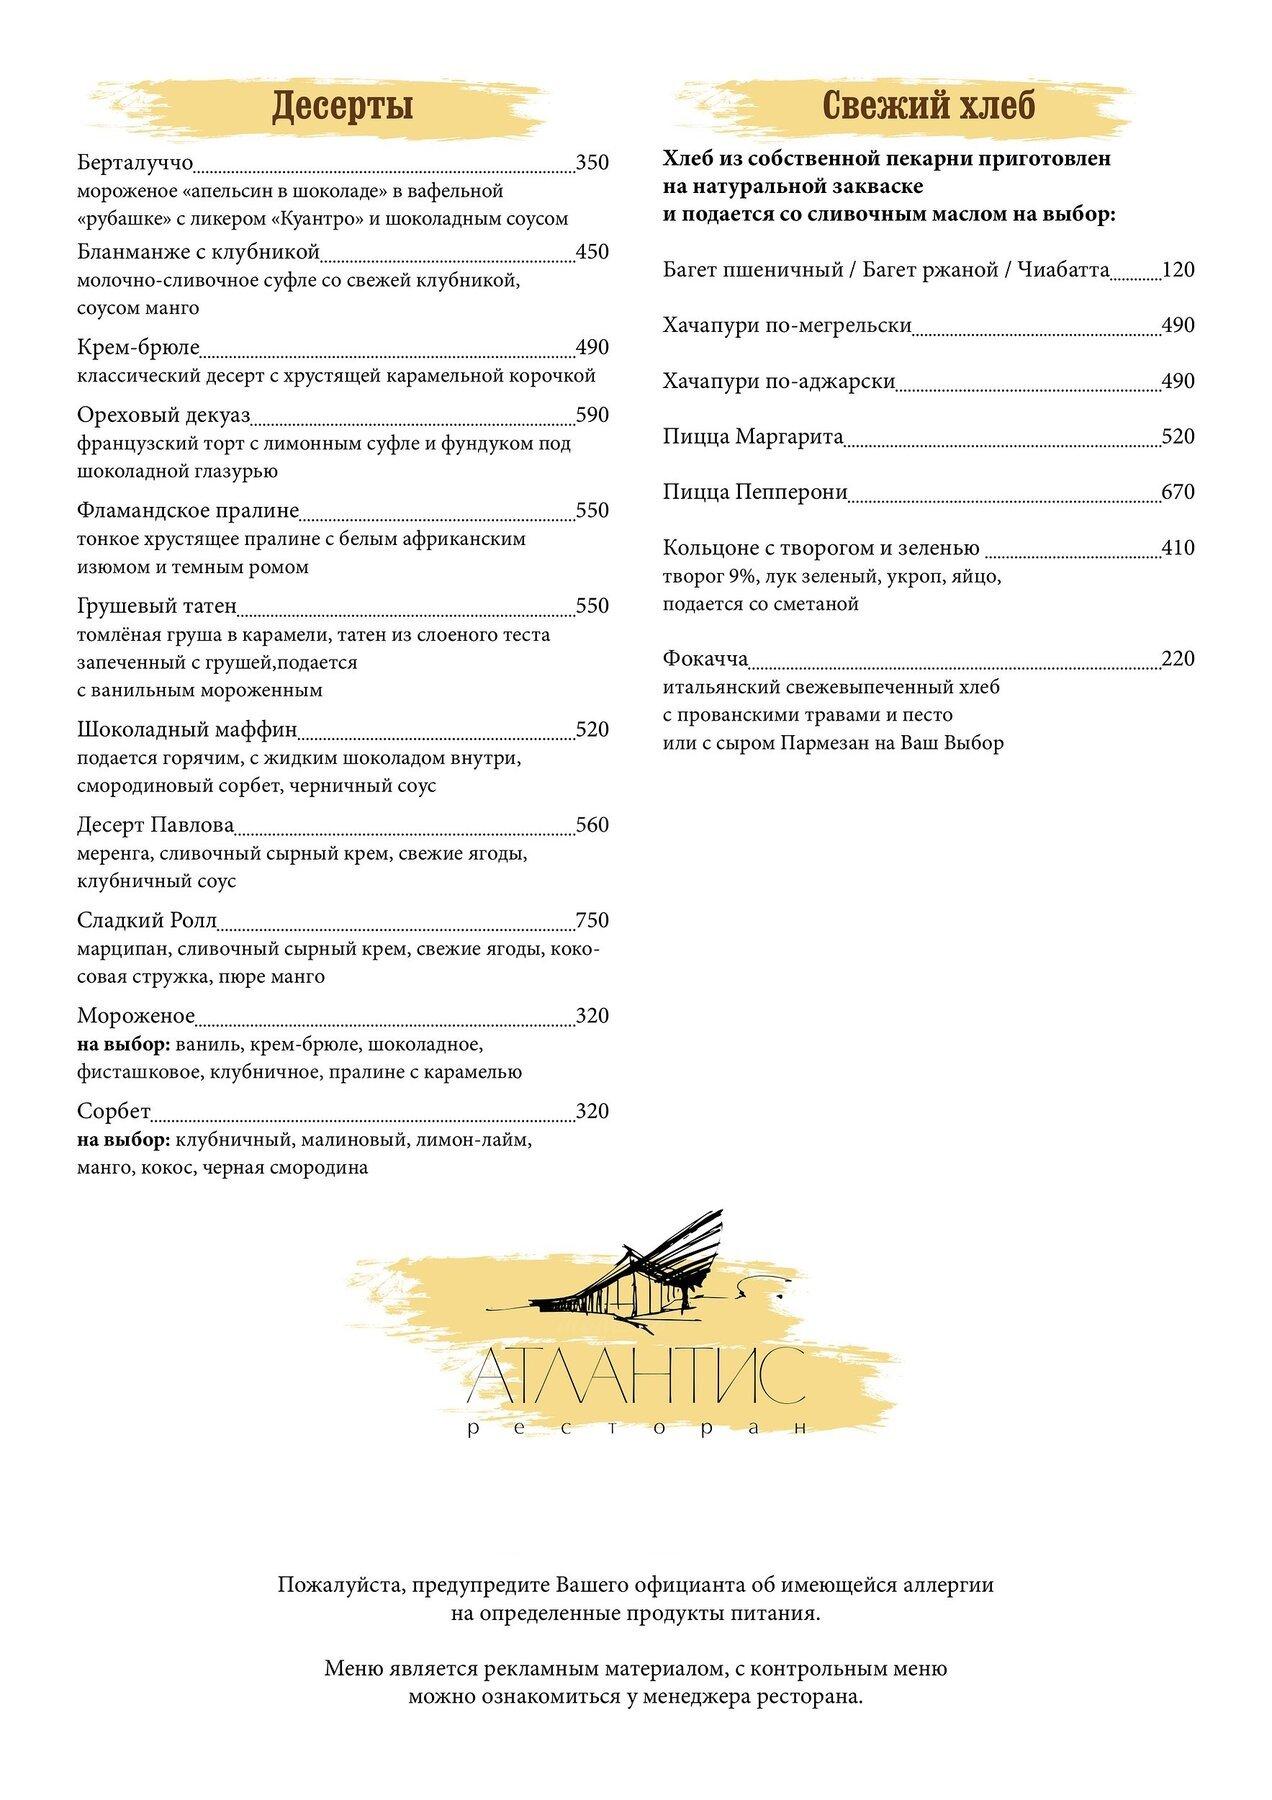 Меню ресторана Атлантис на Дачной фото 3